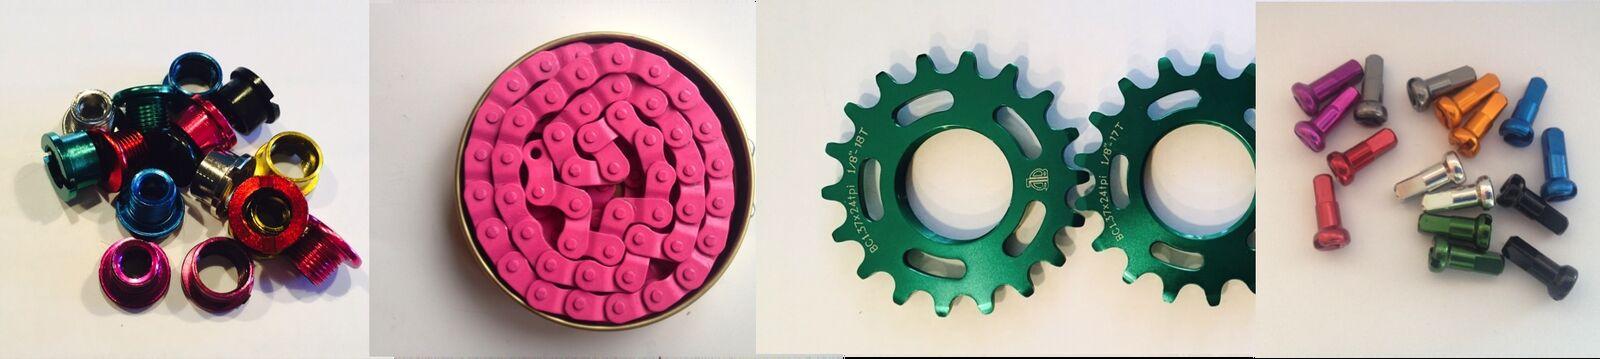 Handbuiltwheels